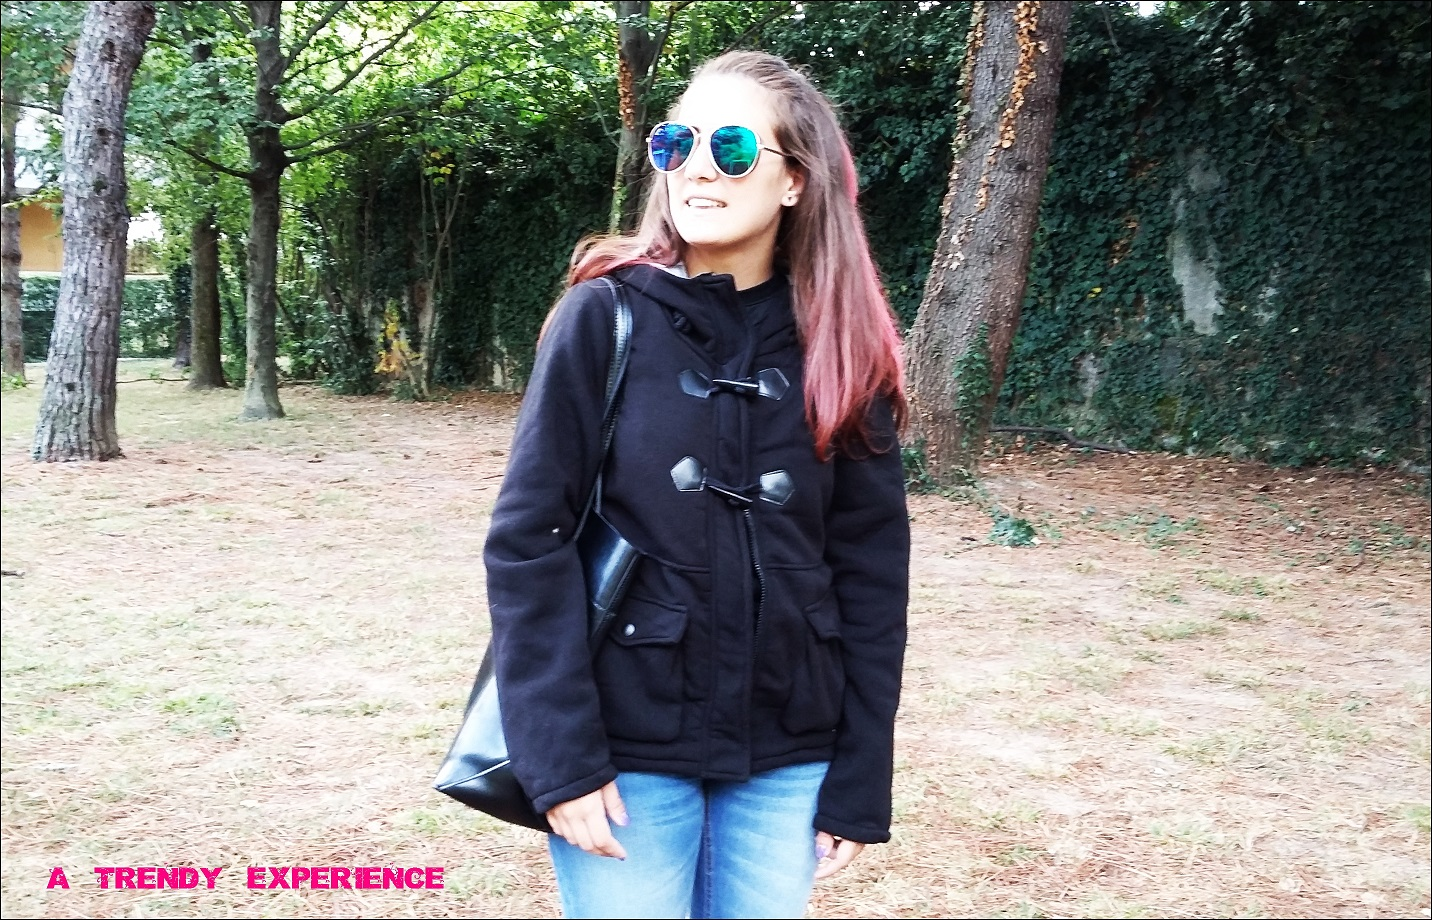 sammydress-a-trendy-experience-023-2